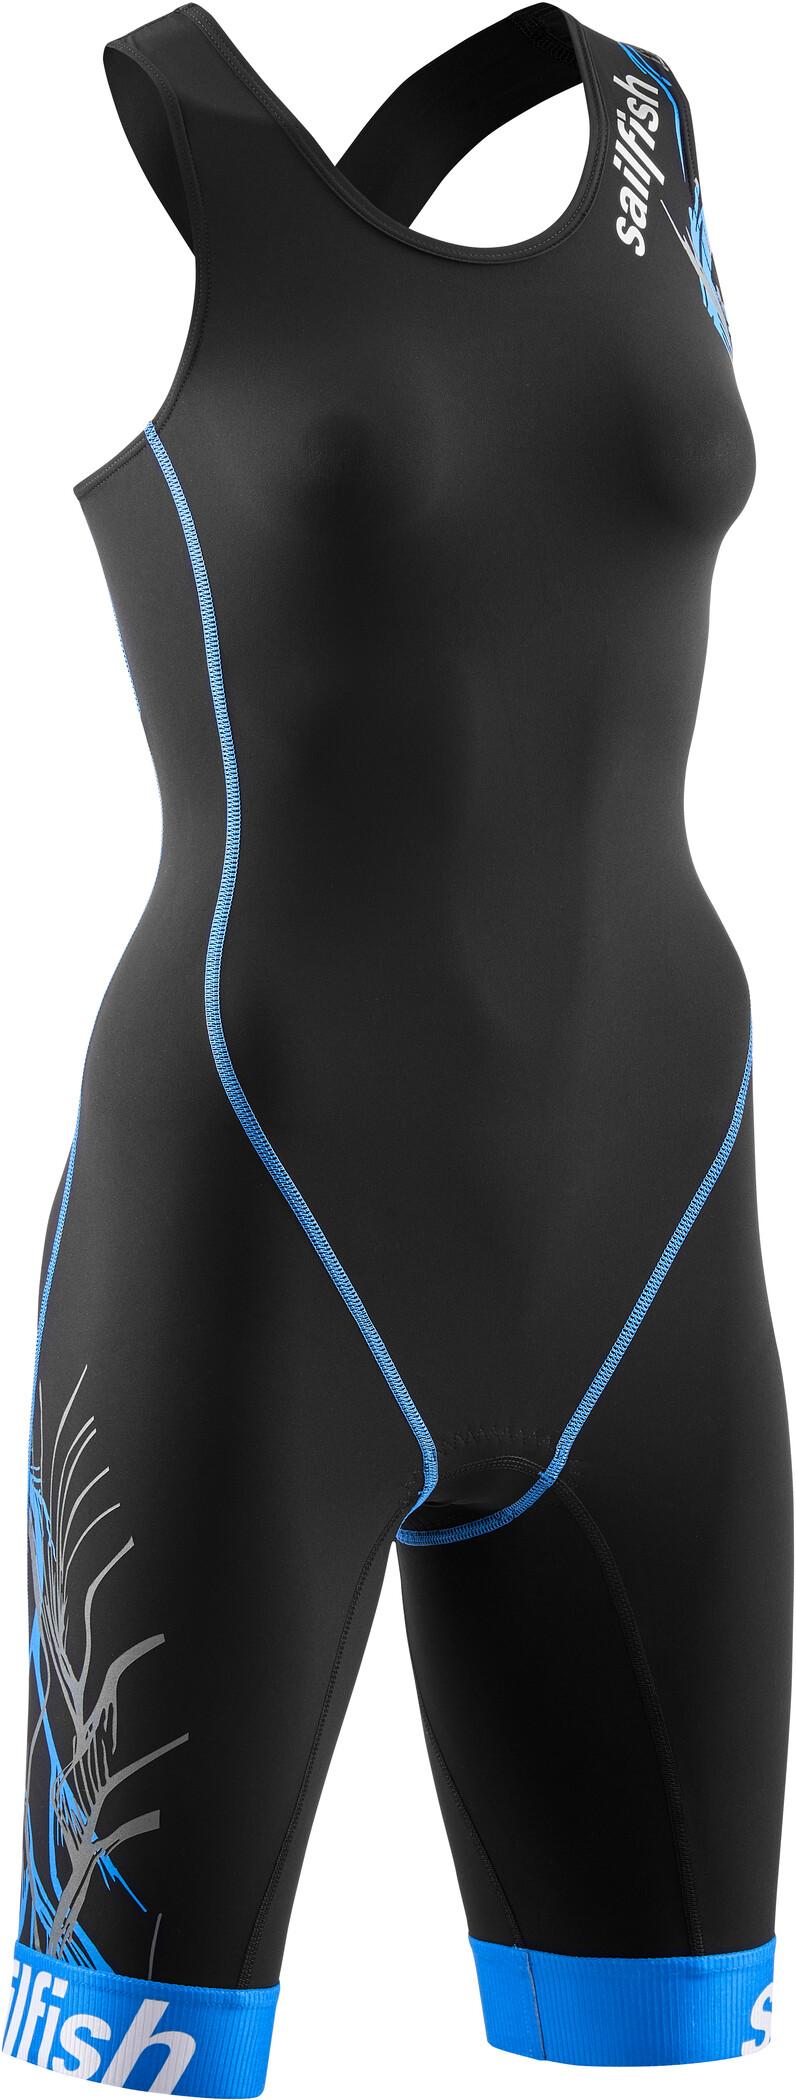 sailfish Pro Triatlondragt Damer, black | Tri-beklædning